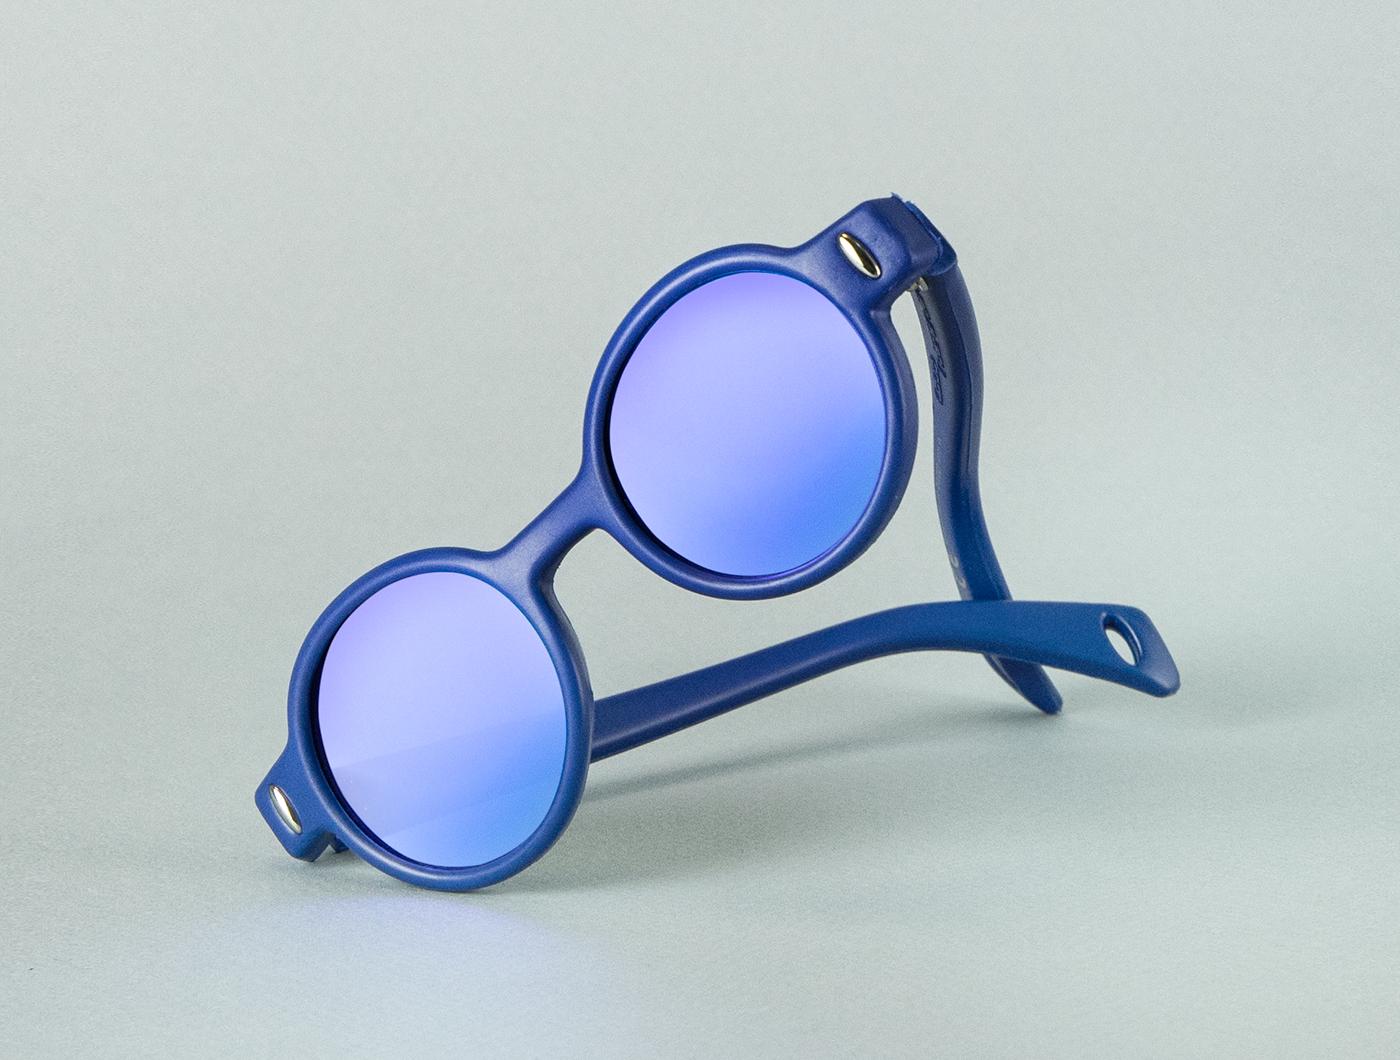 xlextralight-product